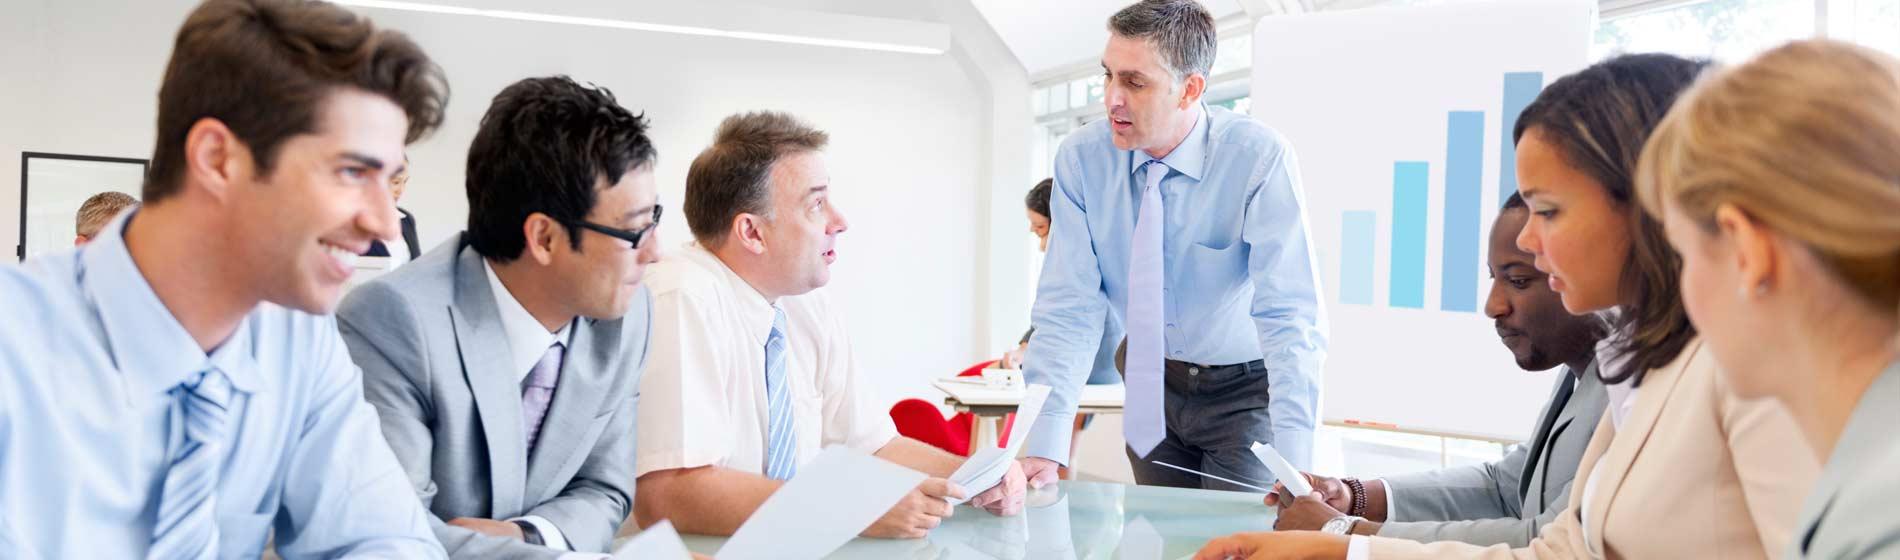 Customer (CRM), Fleet (Part M) and Maintenance (Part 145) management